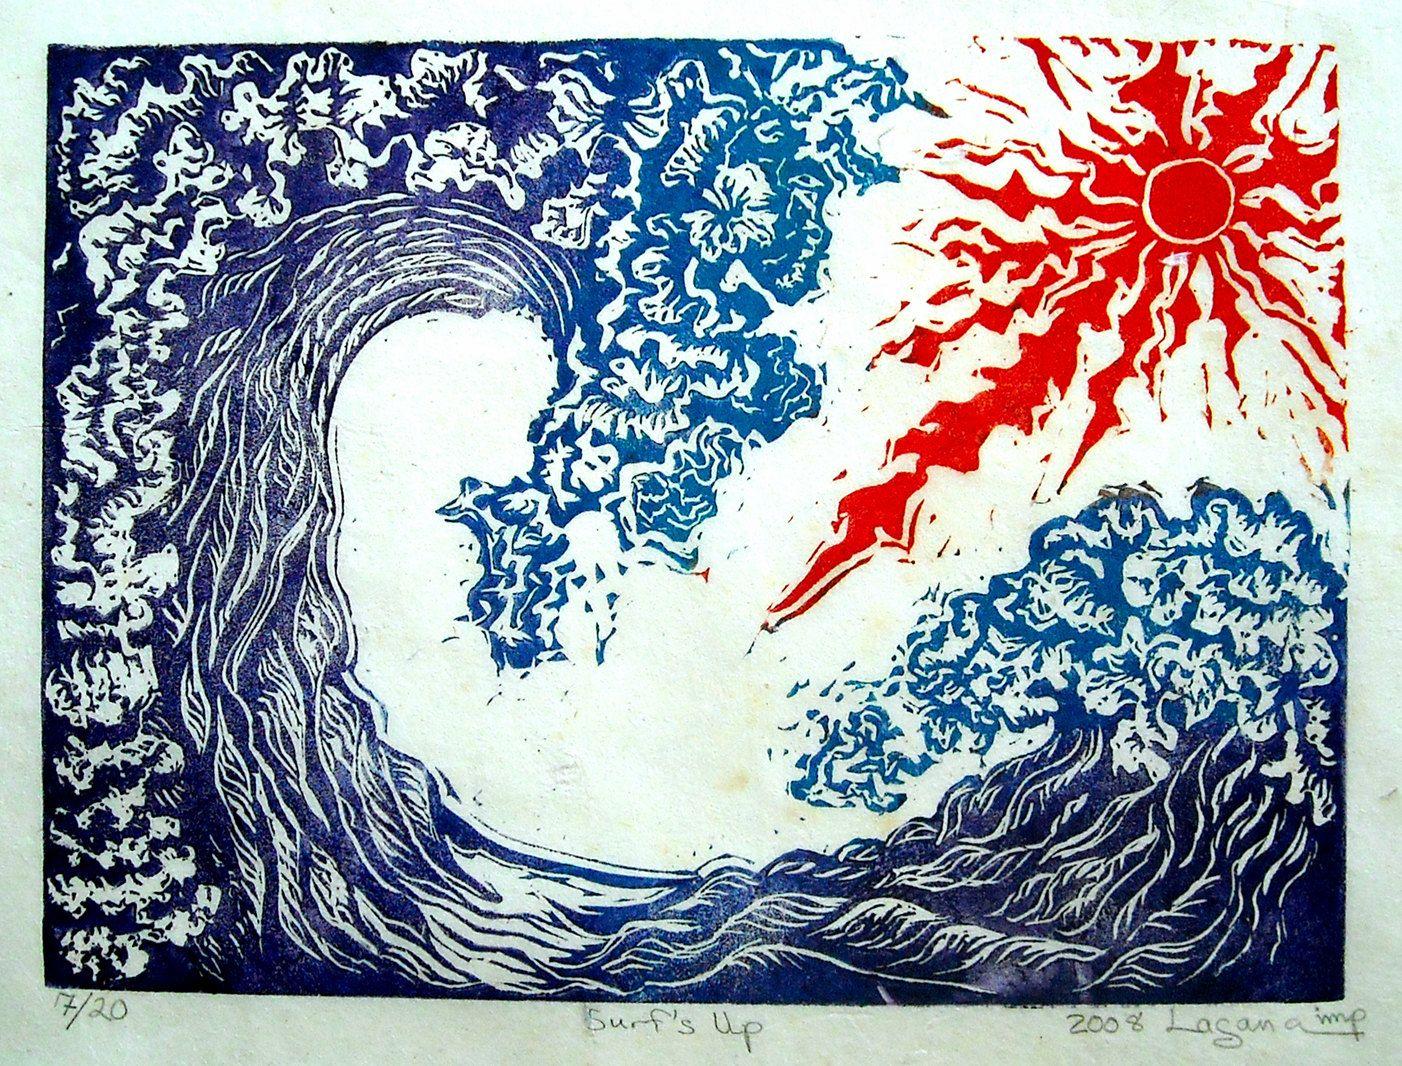 Surfs Up Limited Edition Color Linoleum Block Print Hand Printed